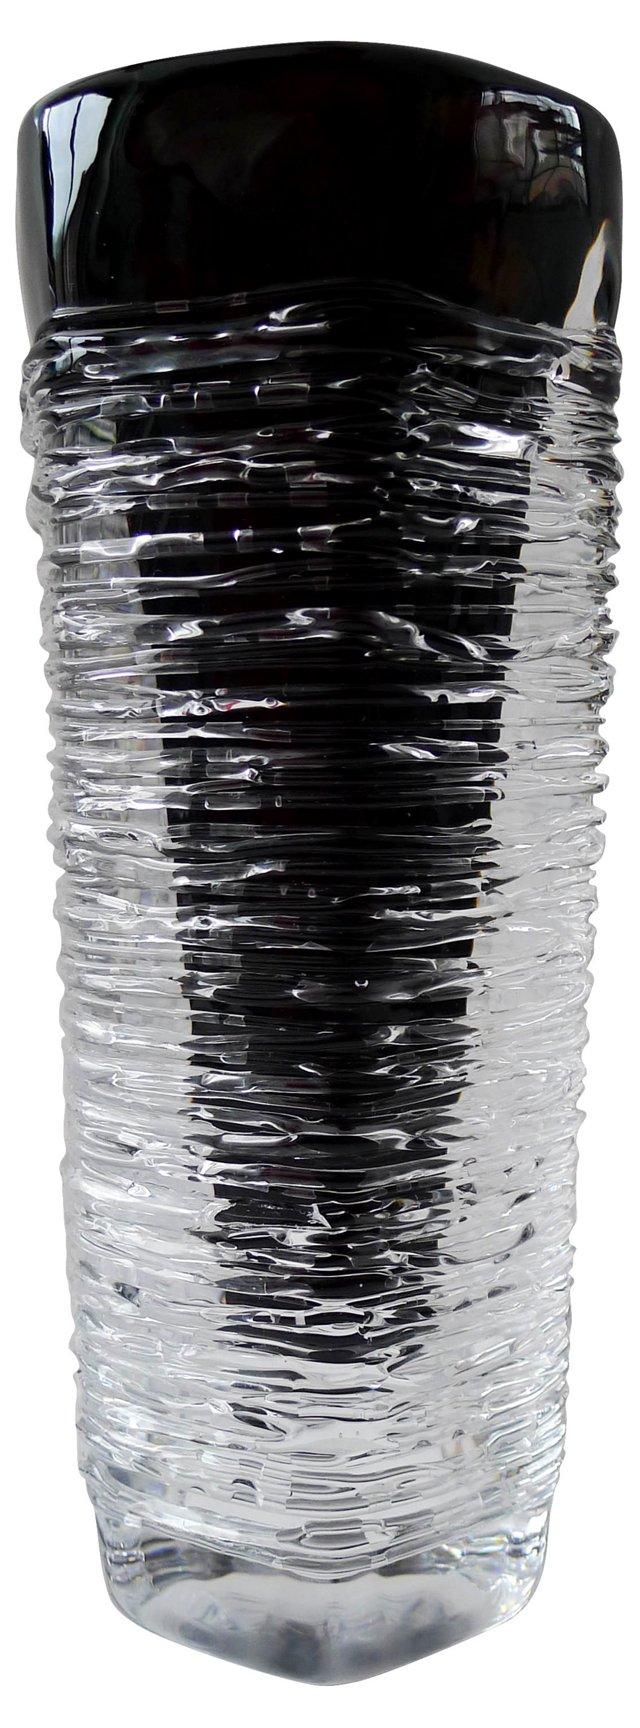 1960s Edenfalk Swedish Vase